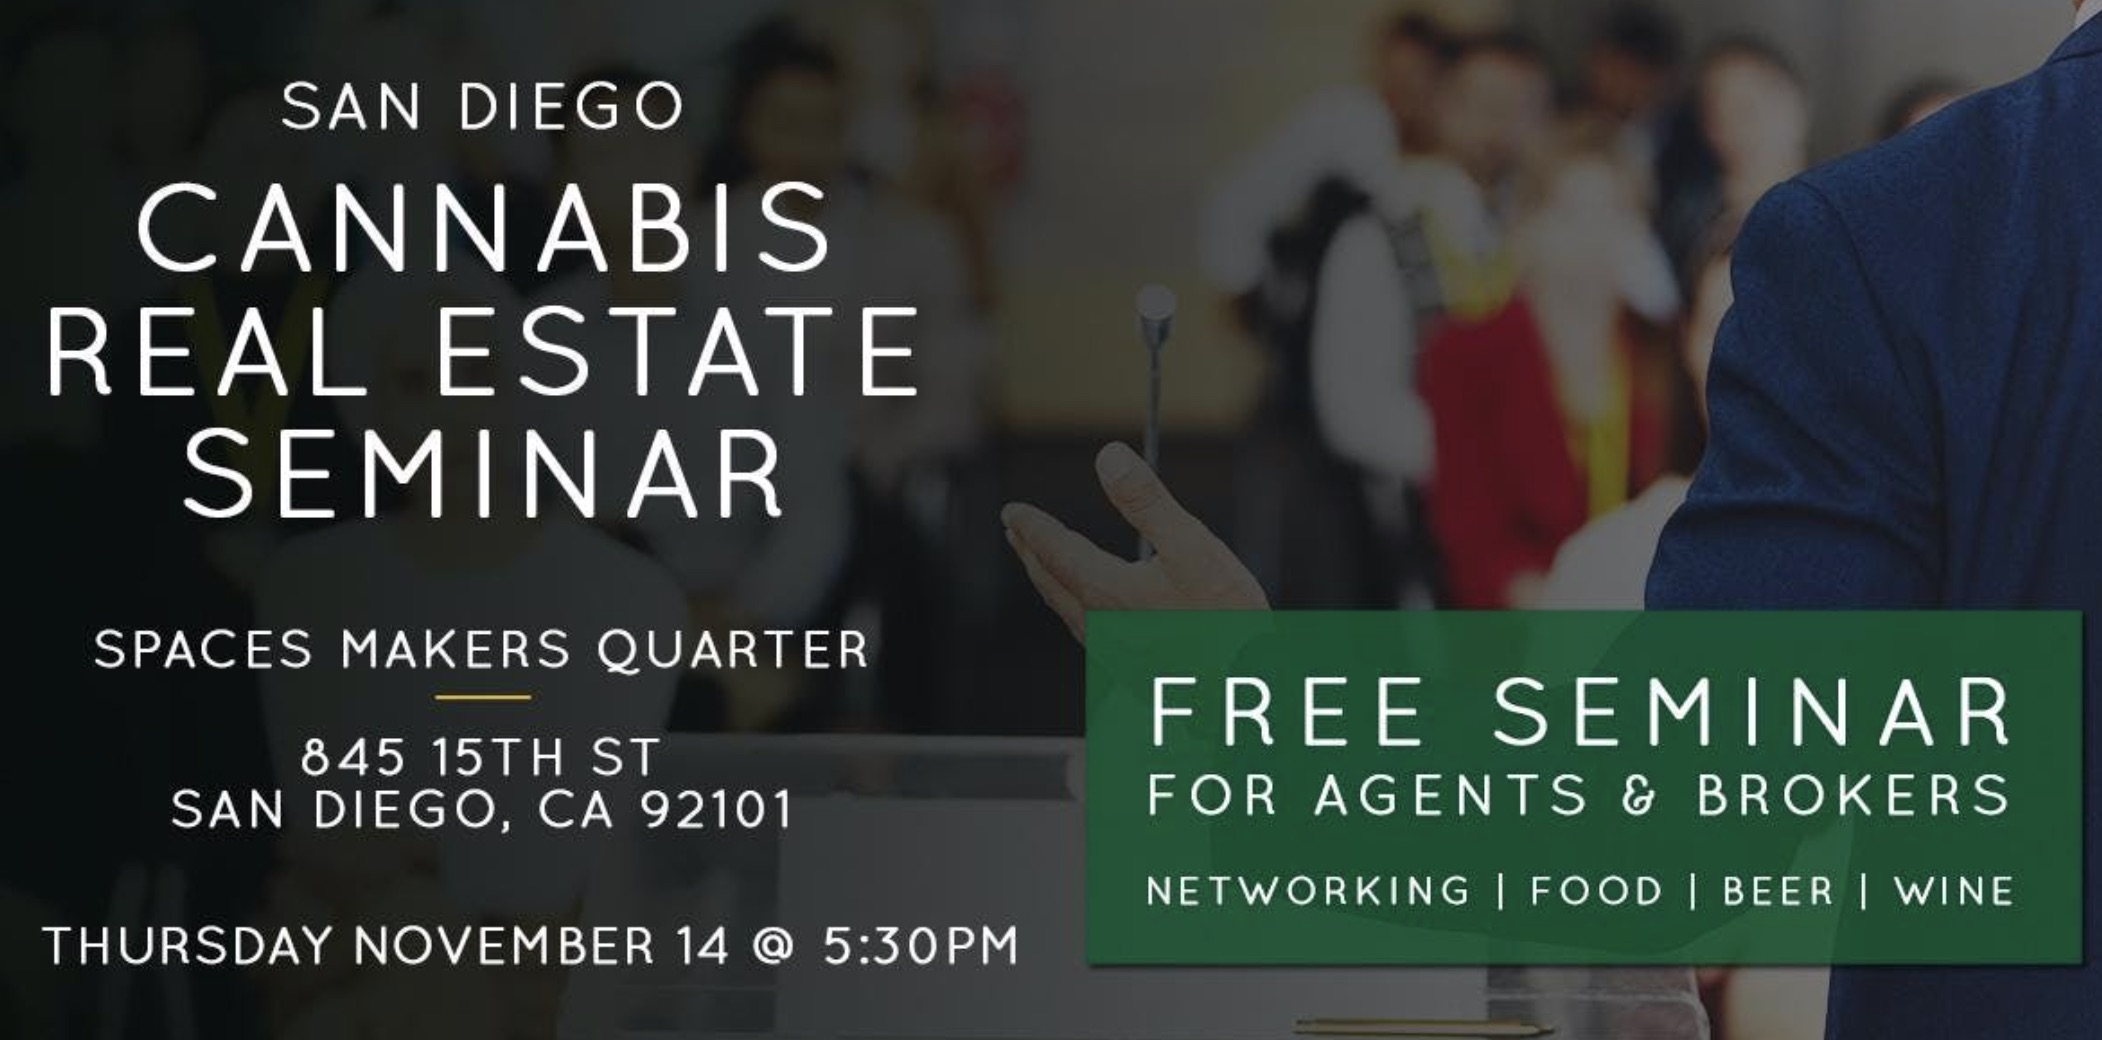 Free Seminar   Cannabis Real Estate in San Diego Nov. 14